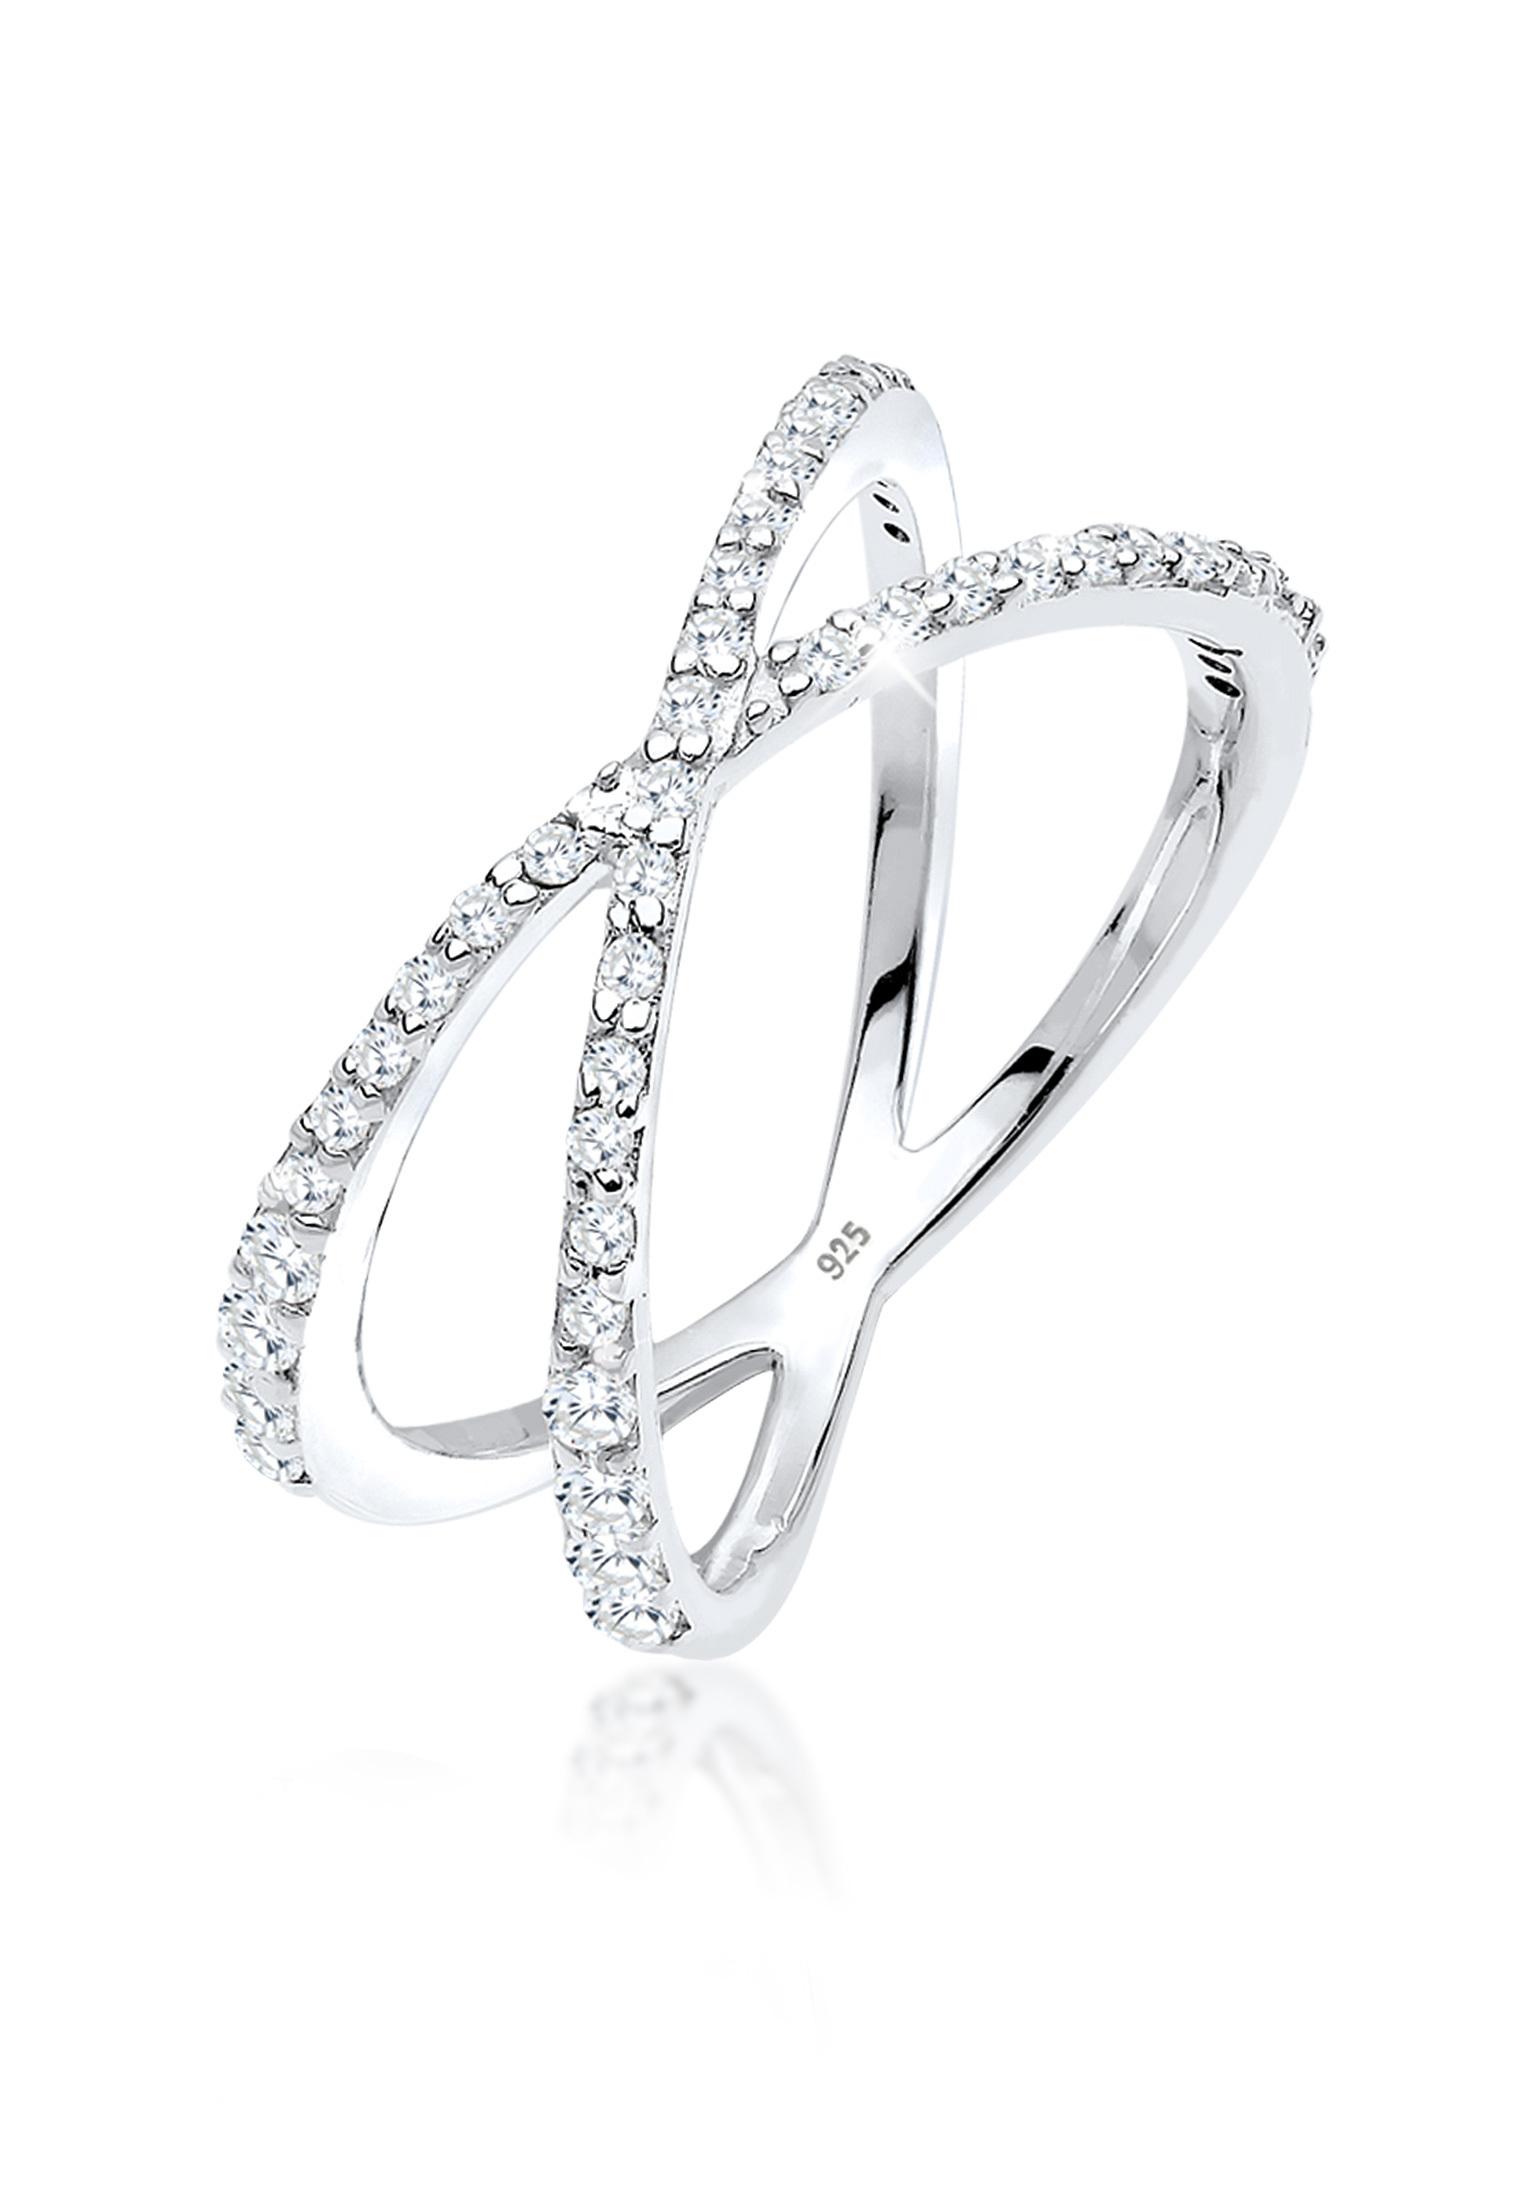 Ring Kreuz | Zirkonia ( Weiß ) | 925er Sterling Silber